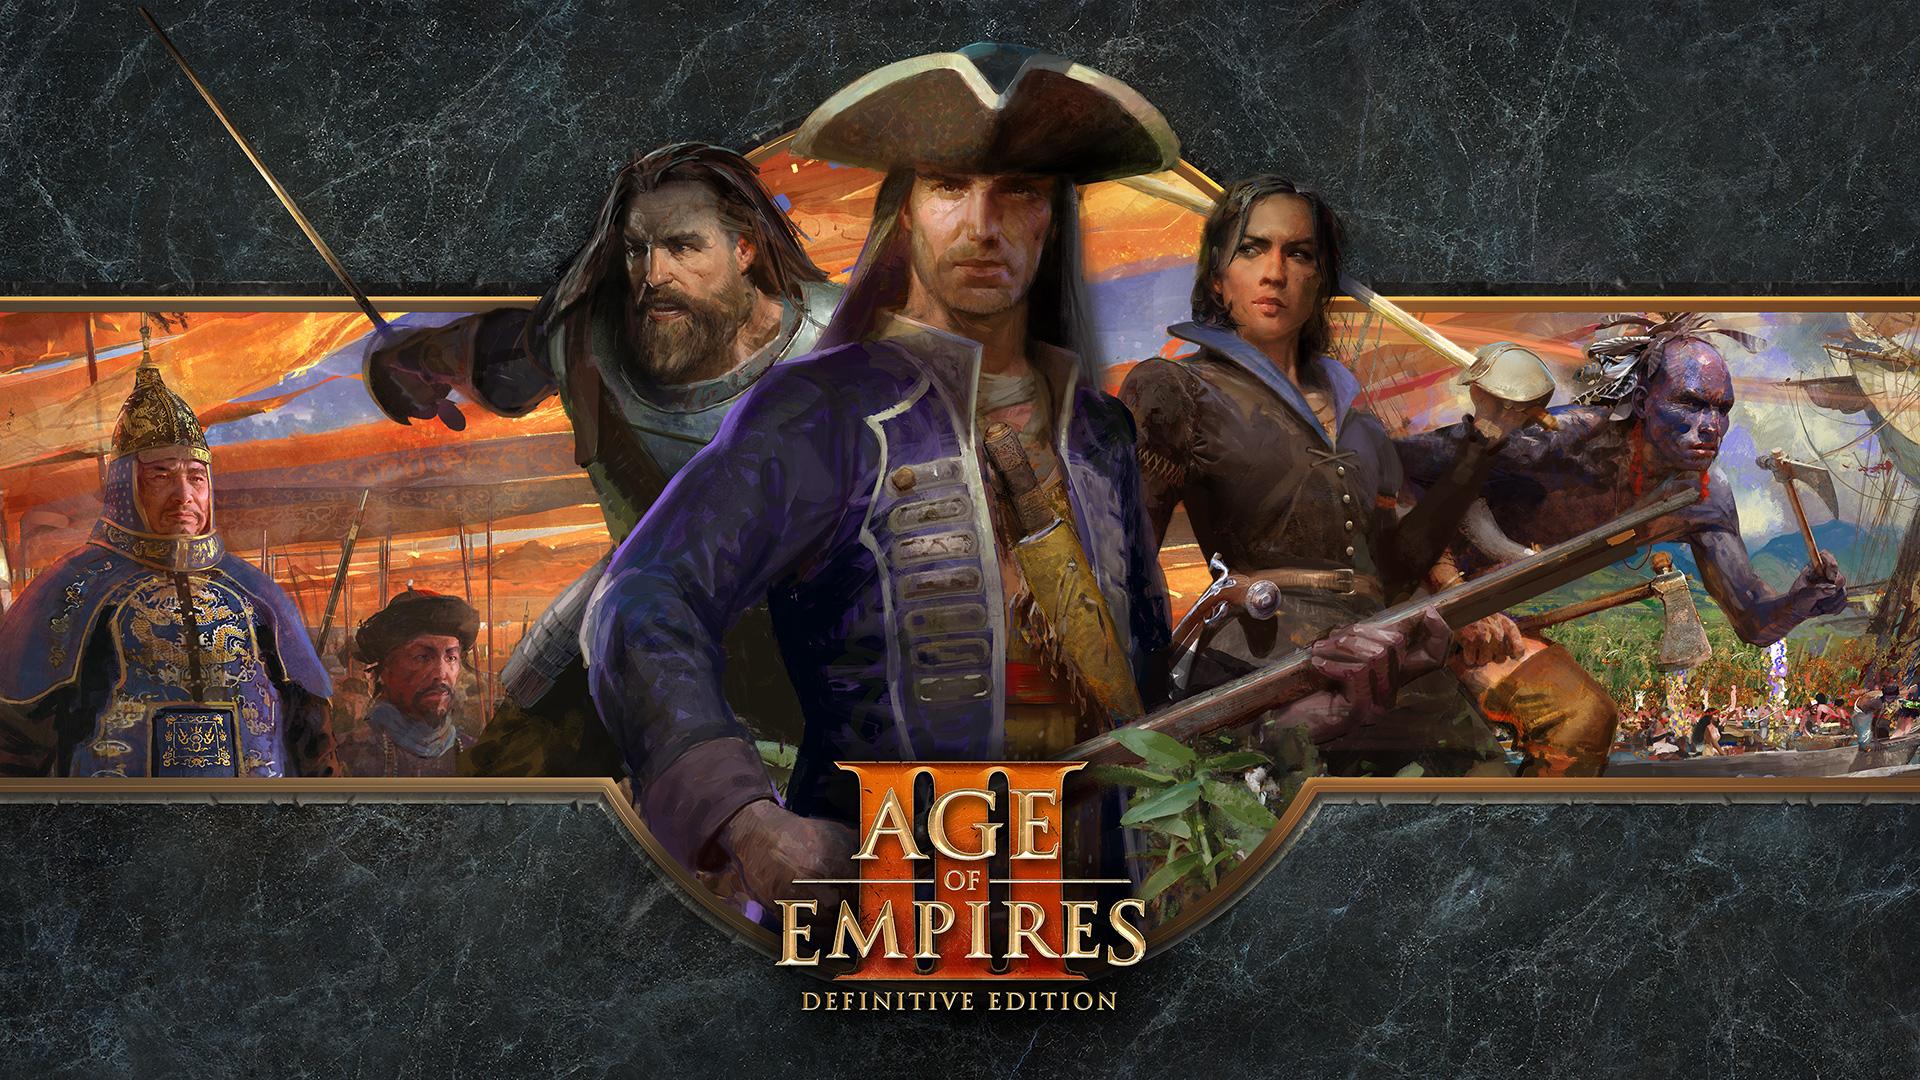 Media Age Of Empires